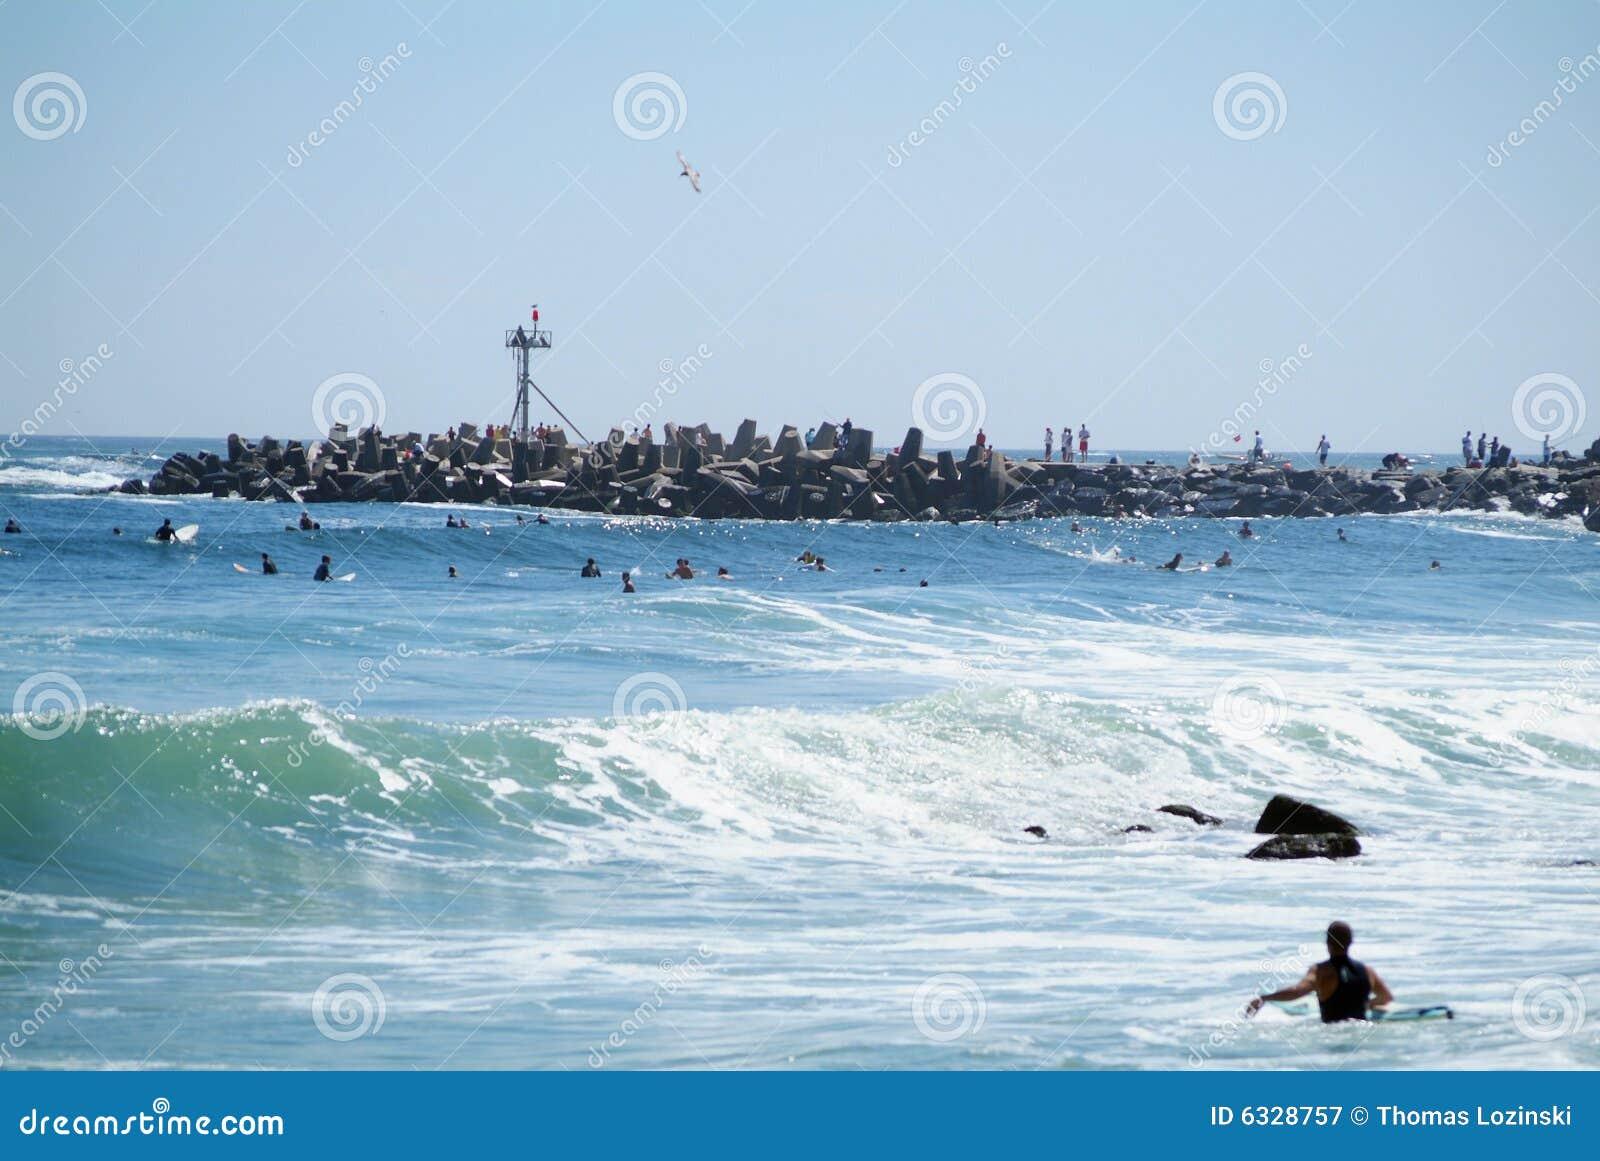 Surfistas demais